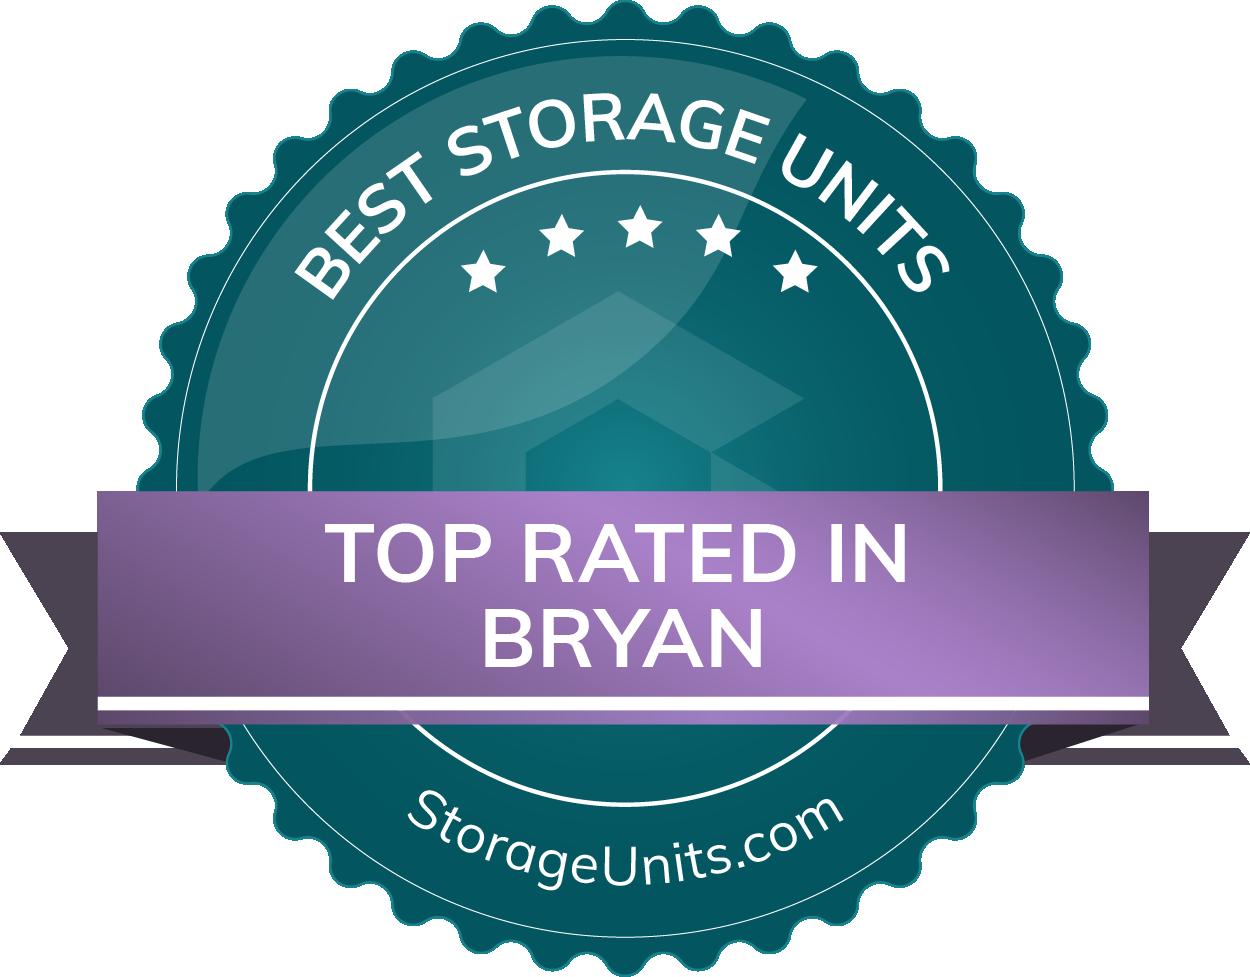 Best Self Storage Units in Bryan, TX